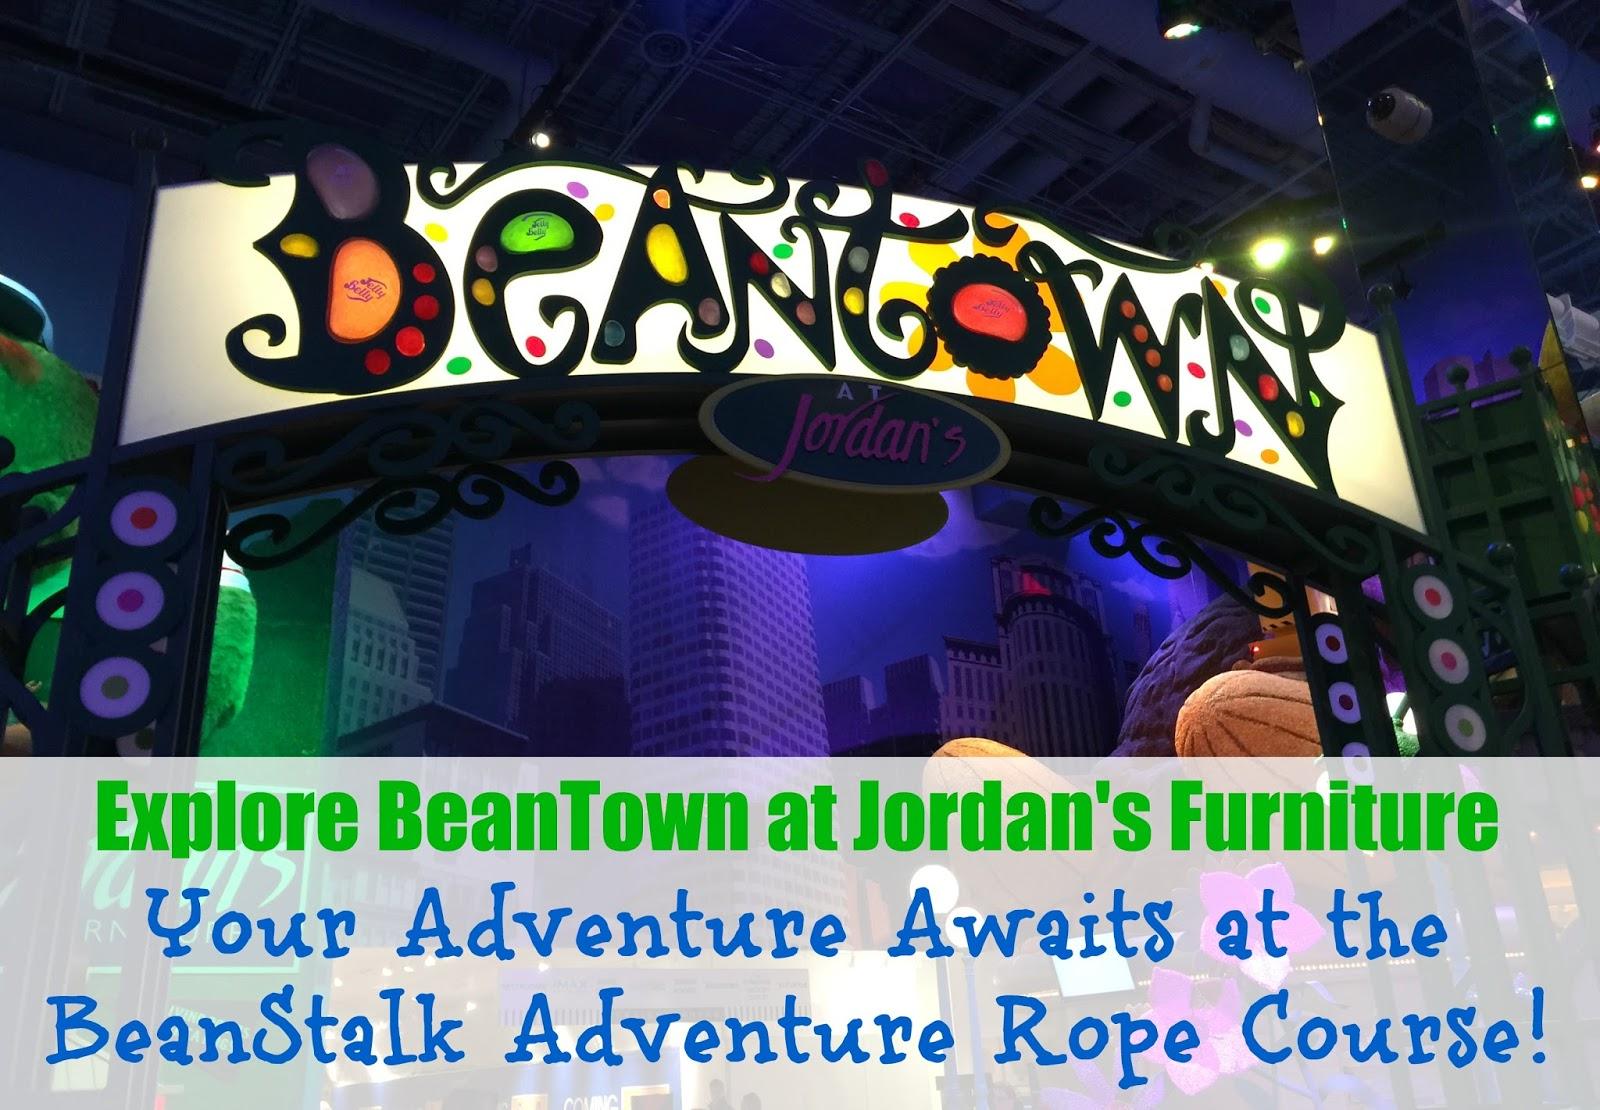 BeanTown at Jordan39s Furniture in Reading Featuring the BeanStalk